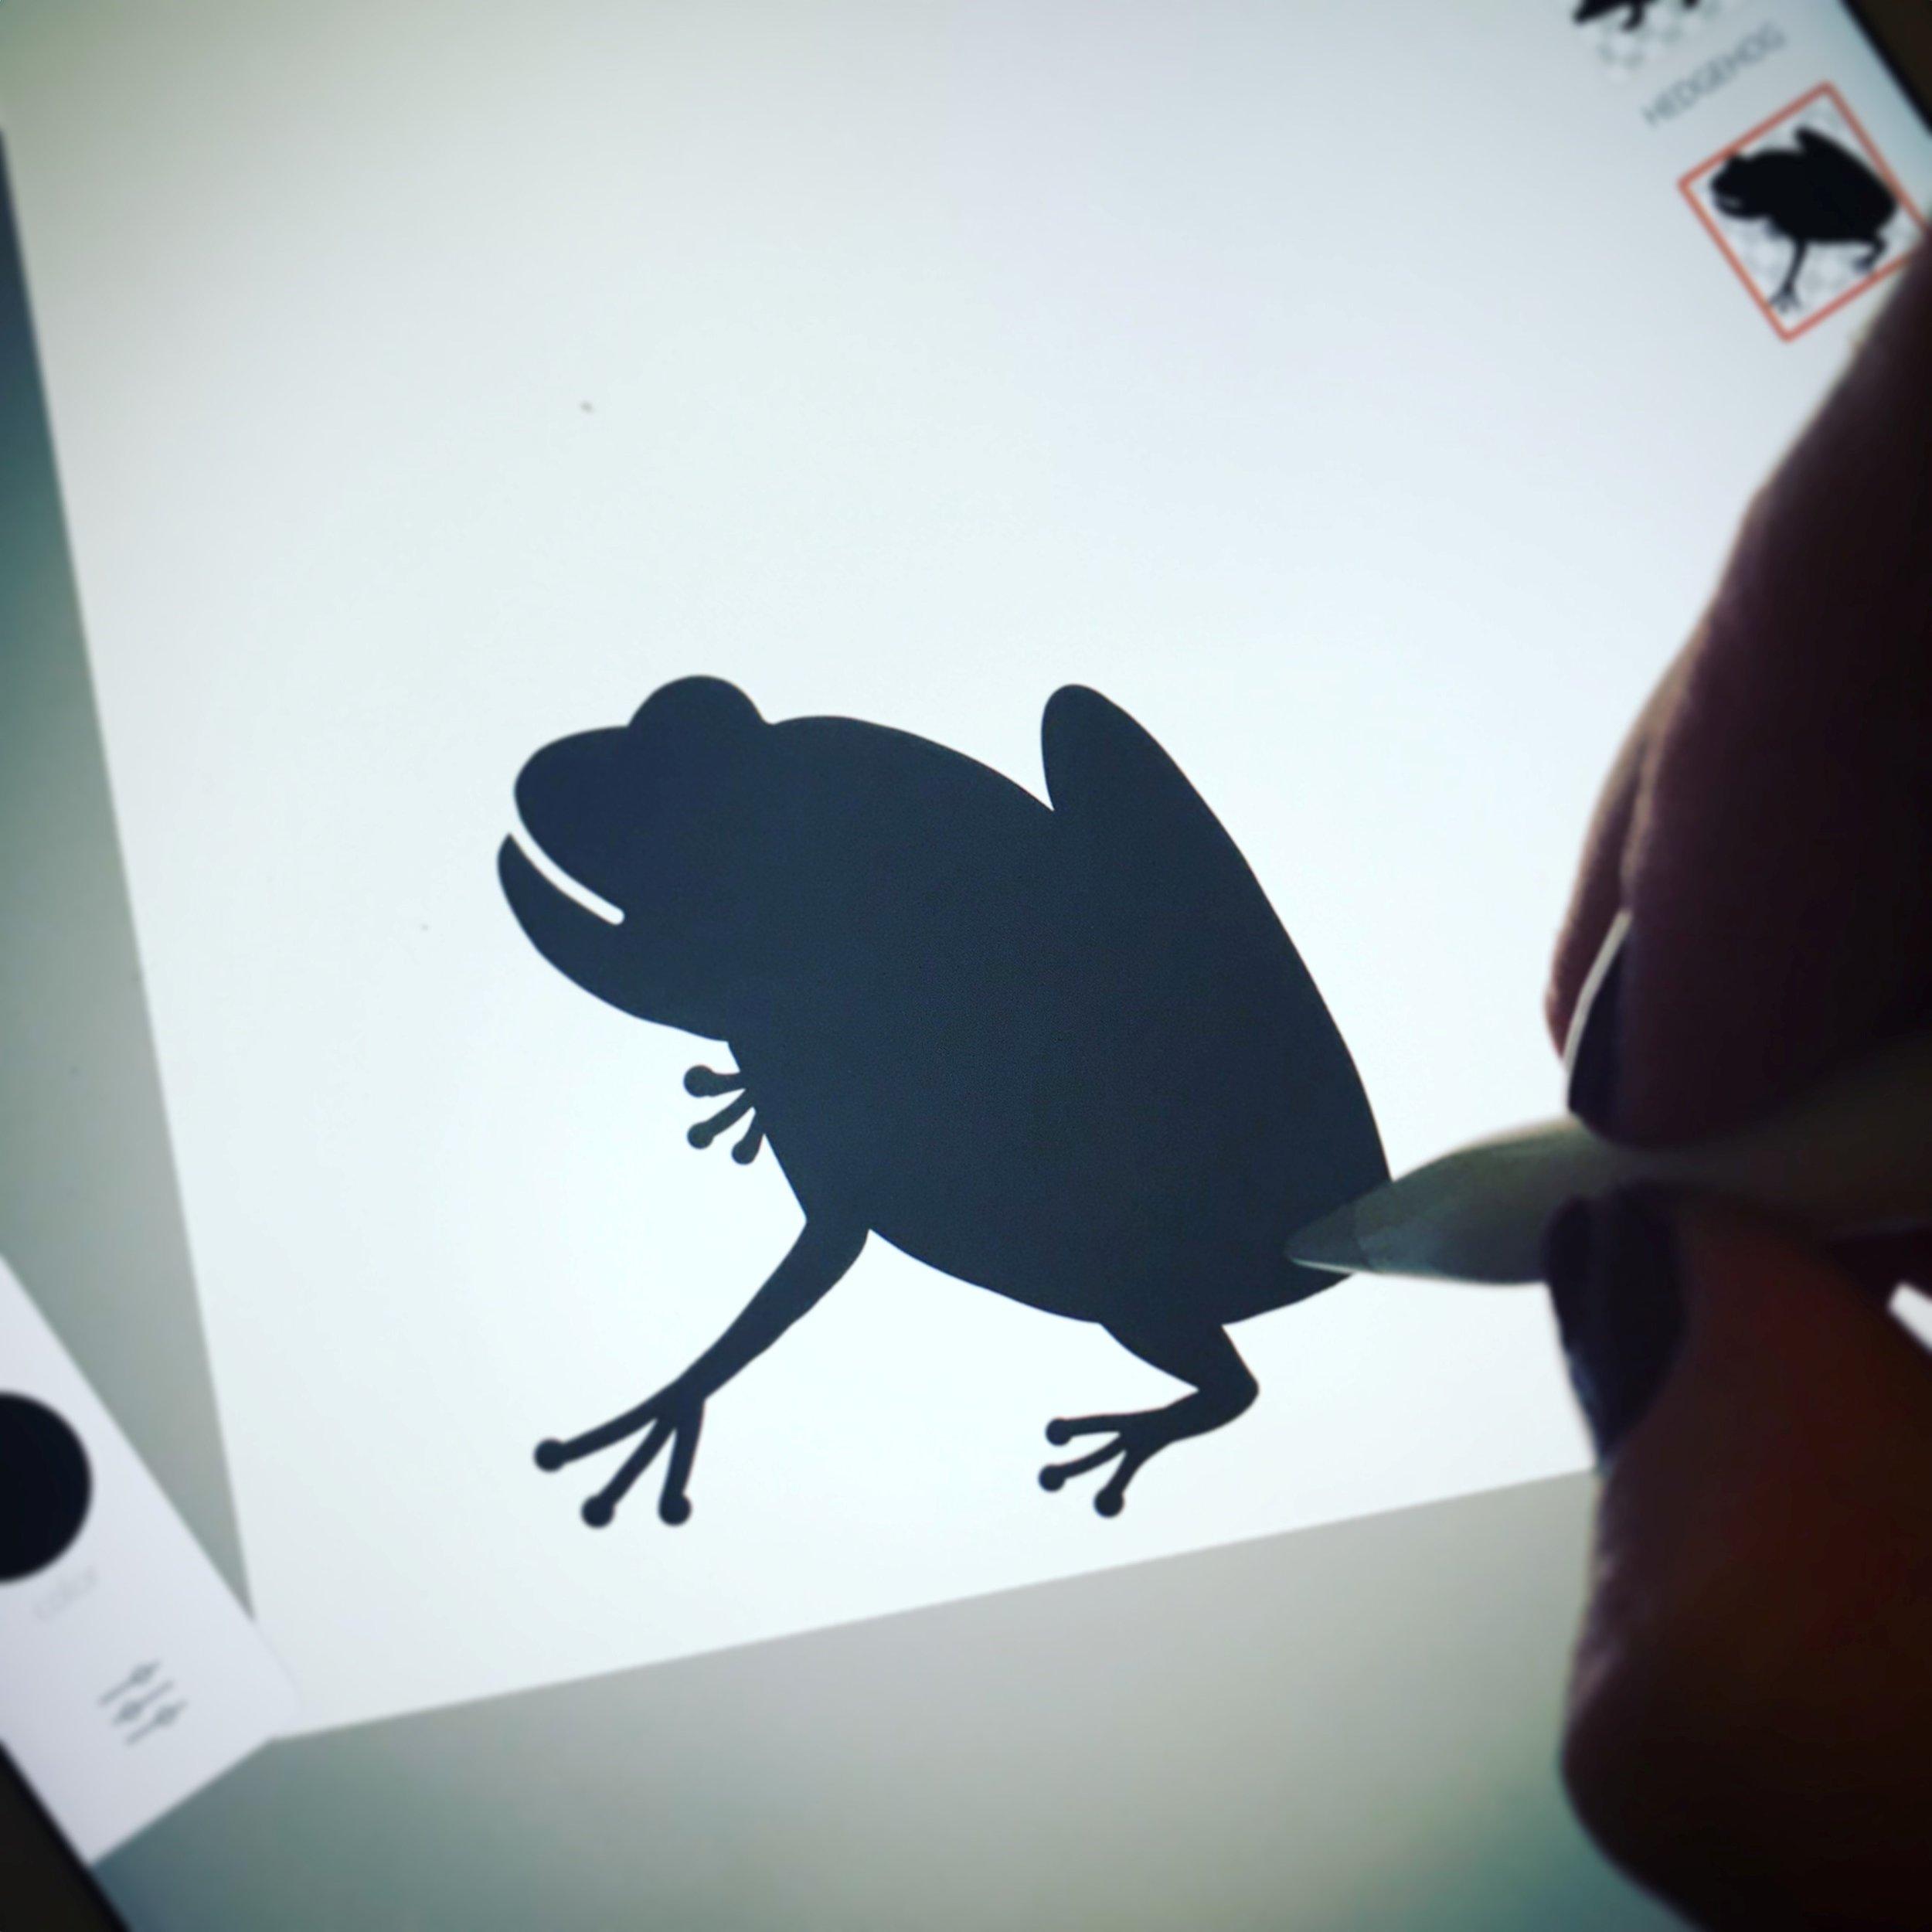 Frog Sketch in progress ©HolchesterDesigns